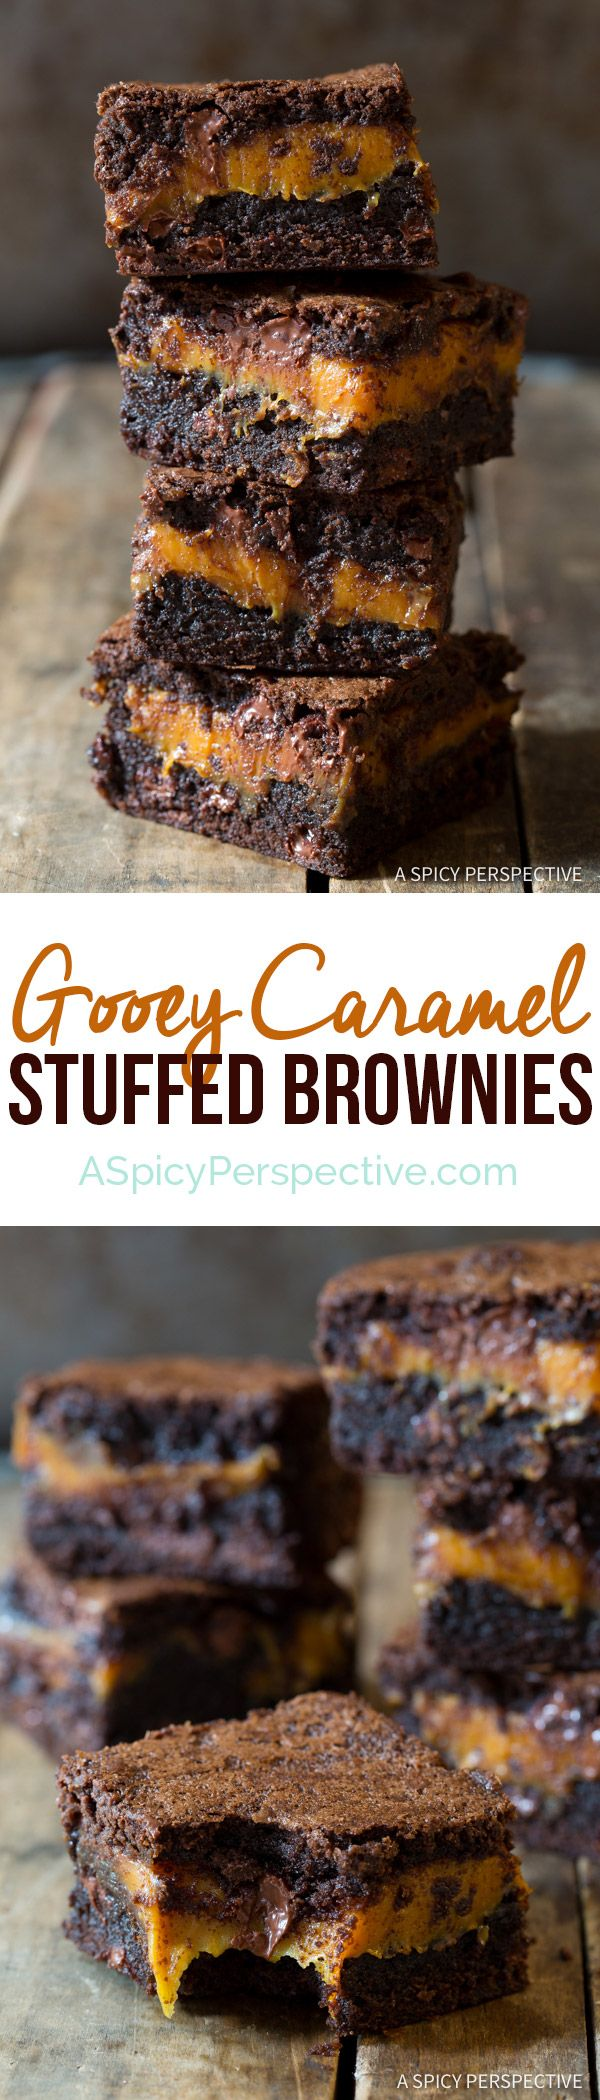 Gooey Caramel Stuffed Brownies   ASpicyPerspective.com